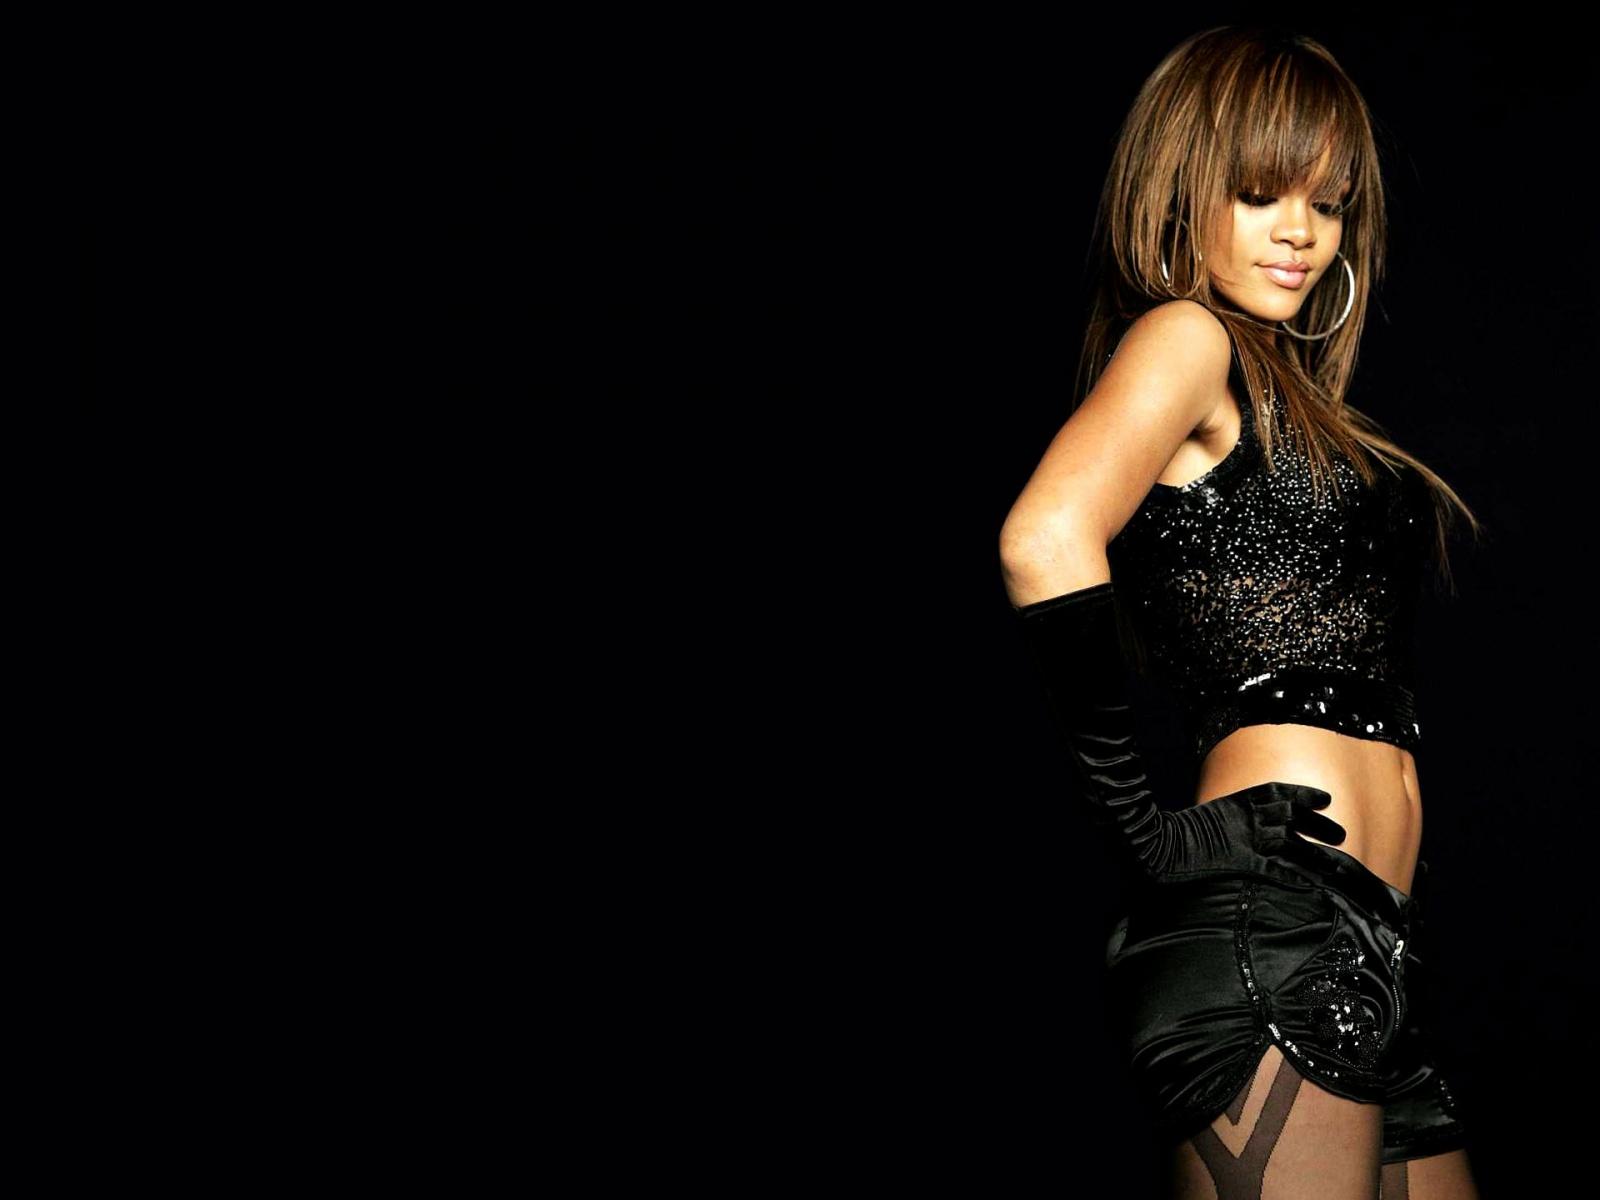 Rihanna Wallpapers Rihanna Sexy Wallpapers 1600x1200